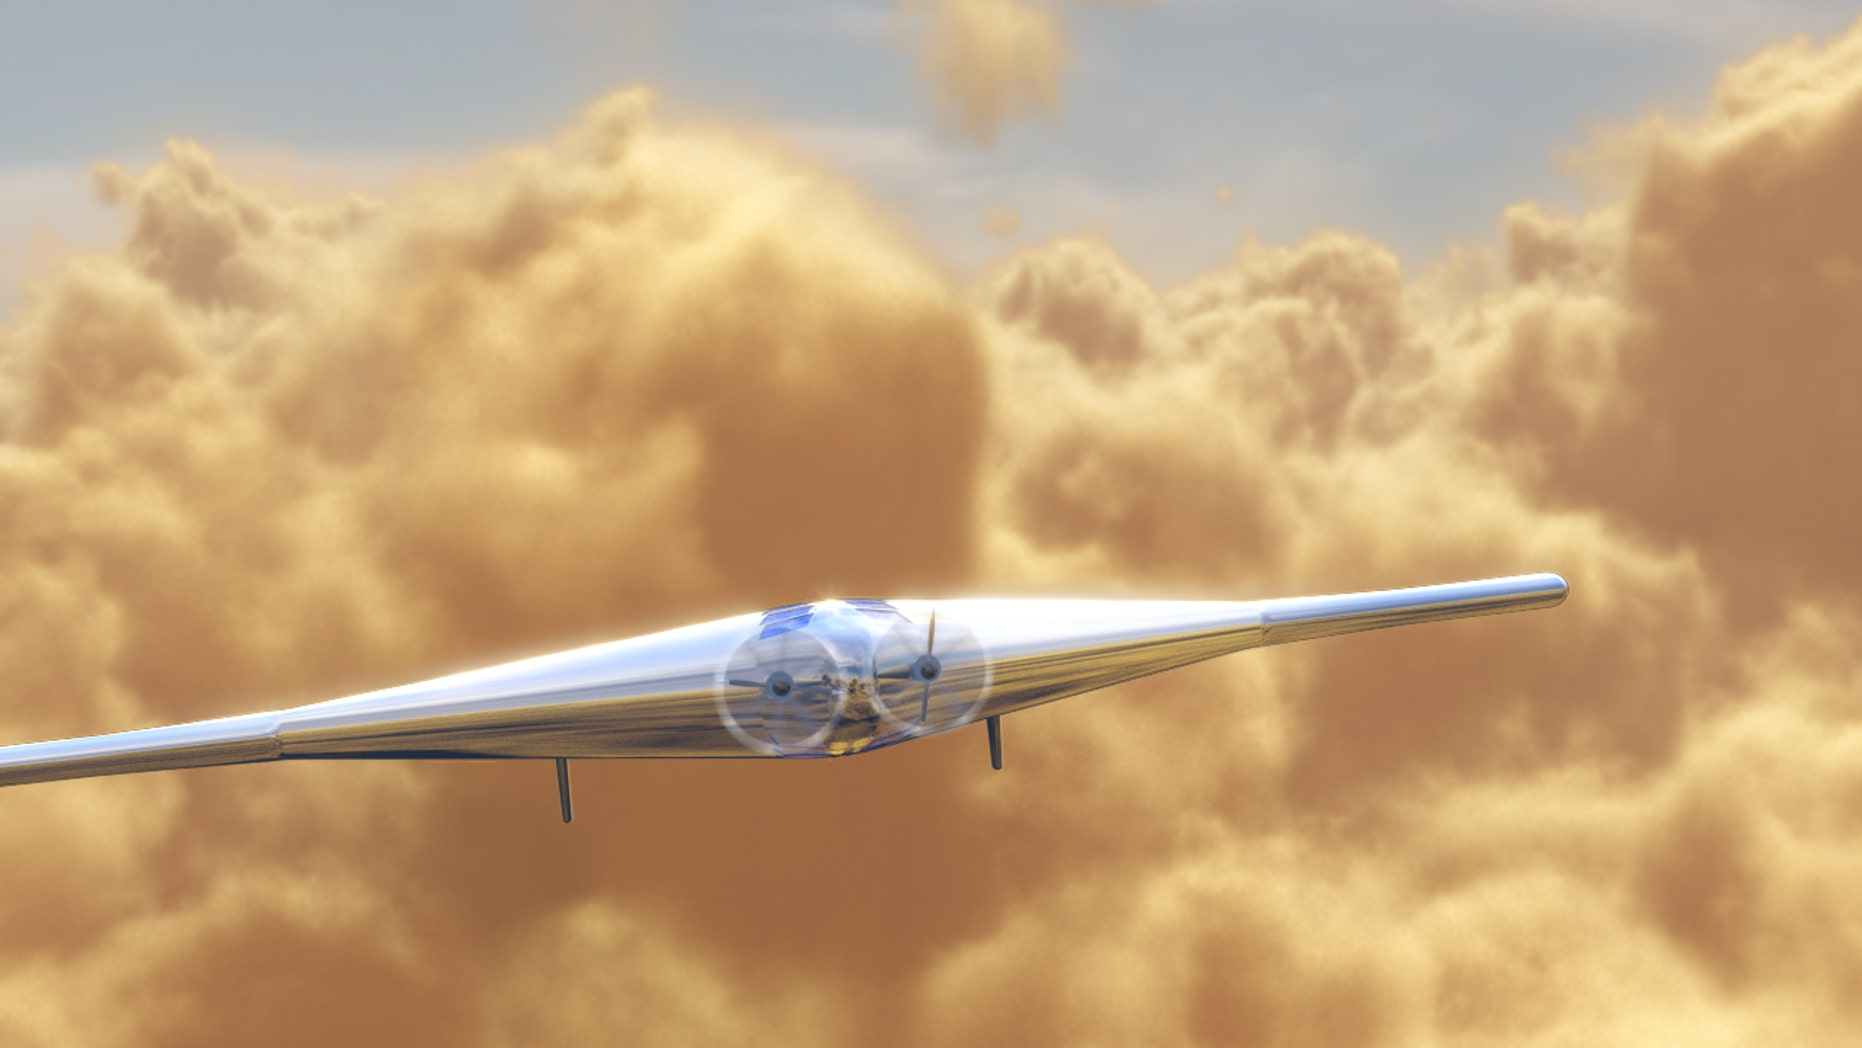 An artist's impression of the uncrewed Venus Atmospheric Maneuverable Platform (VAMP) flying through Venus' clouds.